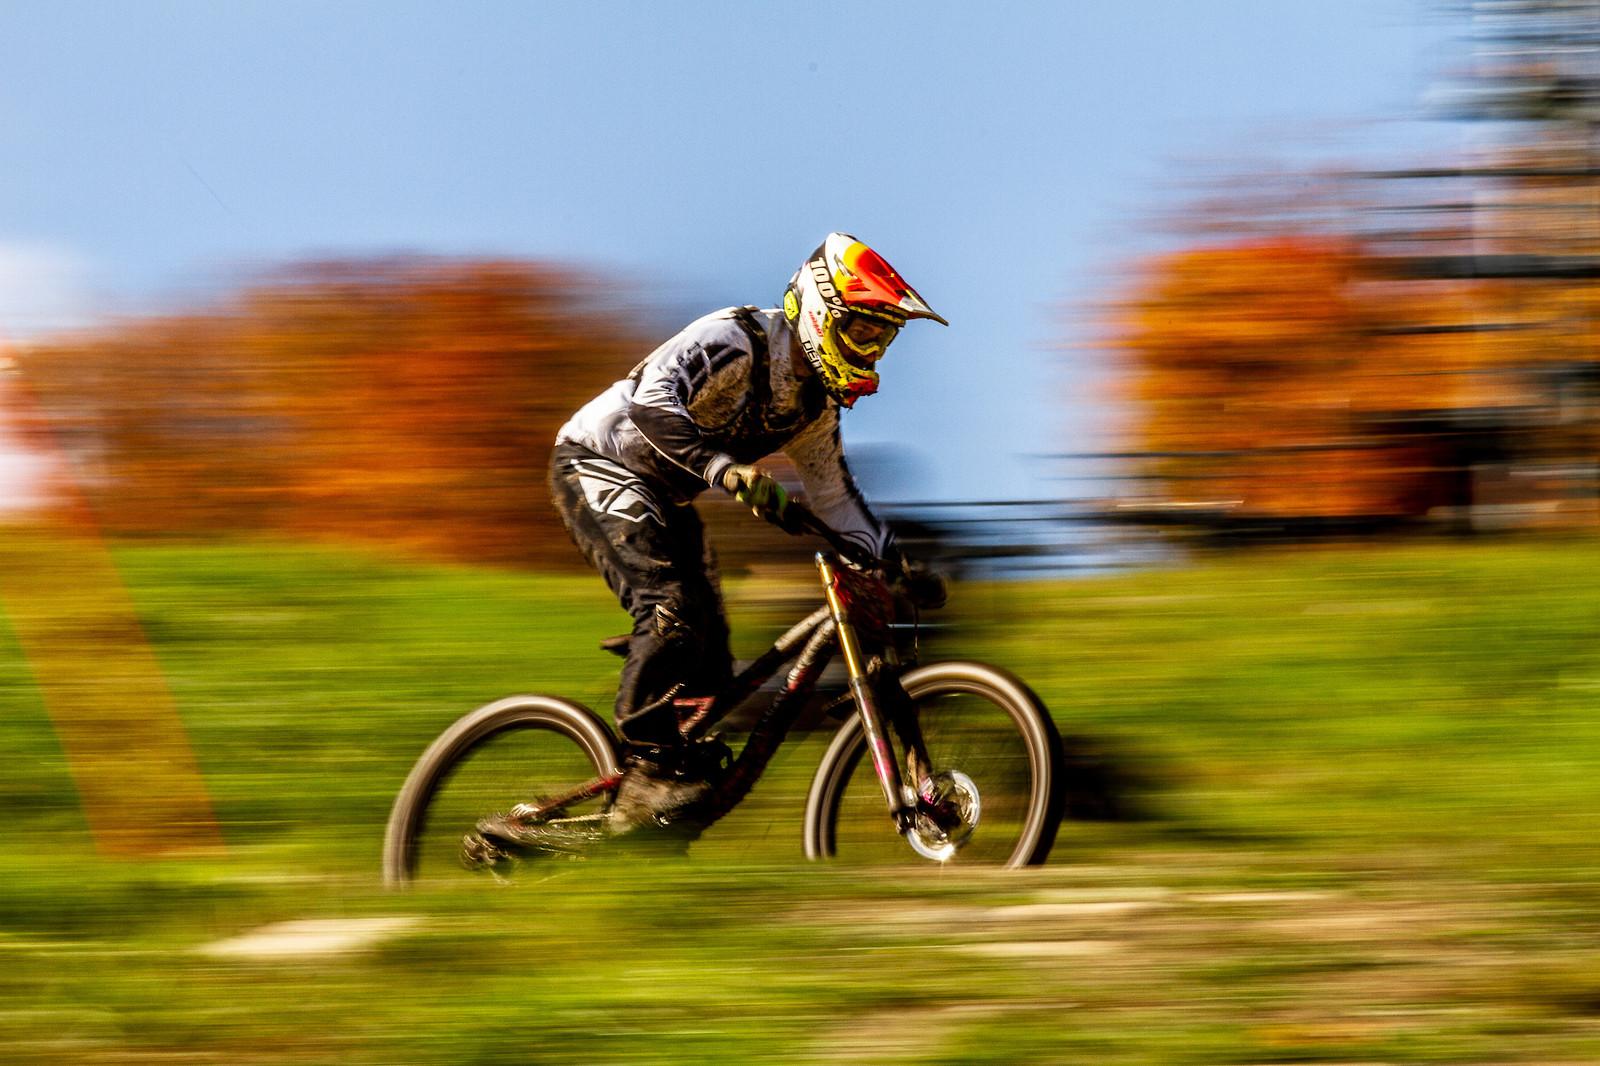 Dan O'Connor - JackRice - Mountain Biking Pictures - Vital MTB